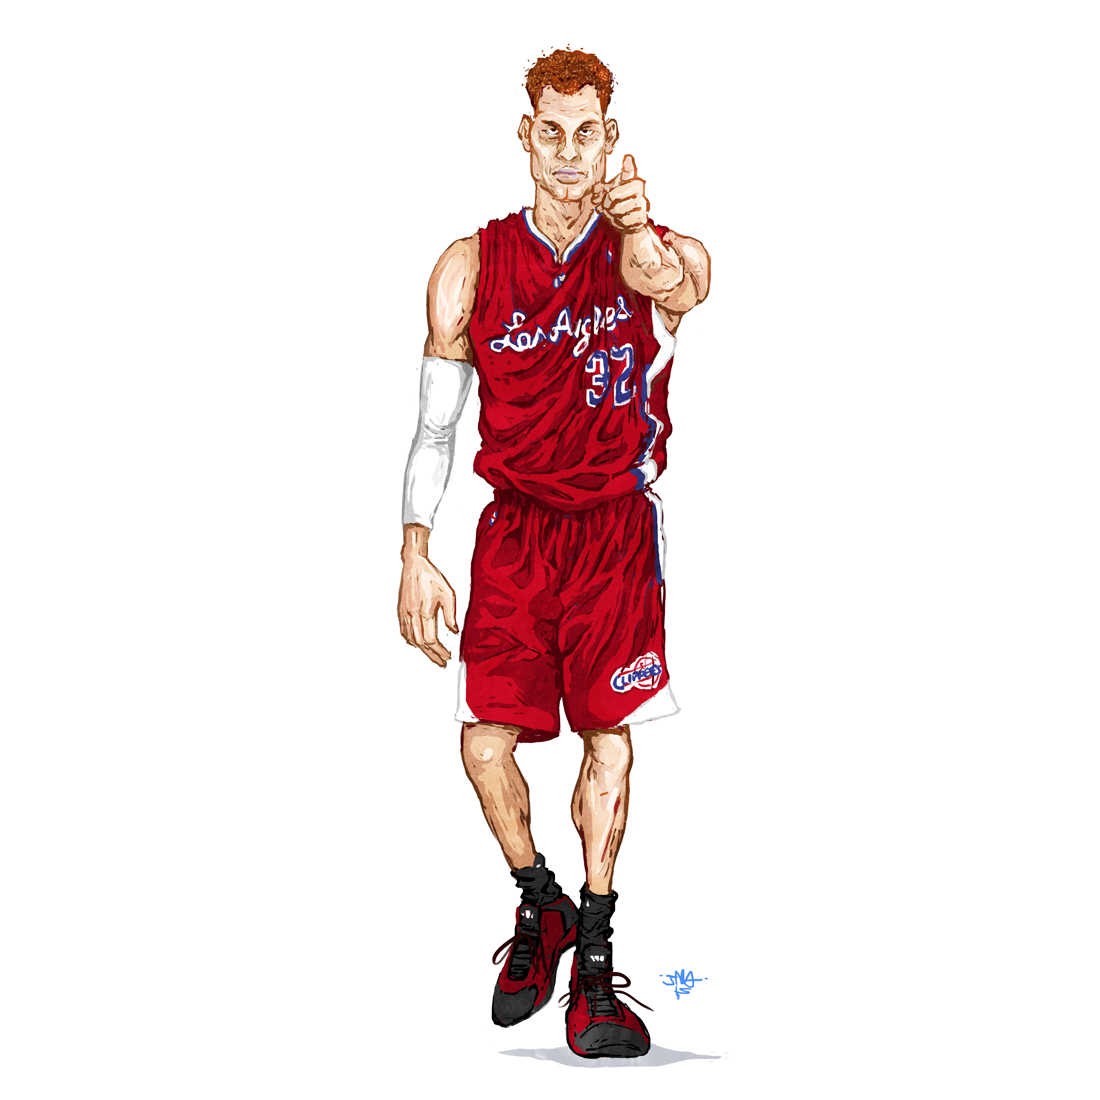 Nba Doodles By Justin Manzana Nba Artwork Nba Basketball Art Sport Illustration